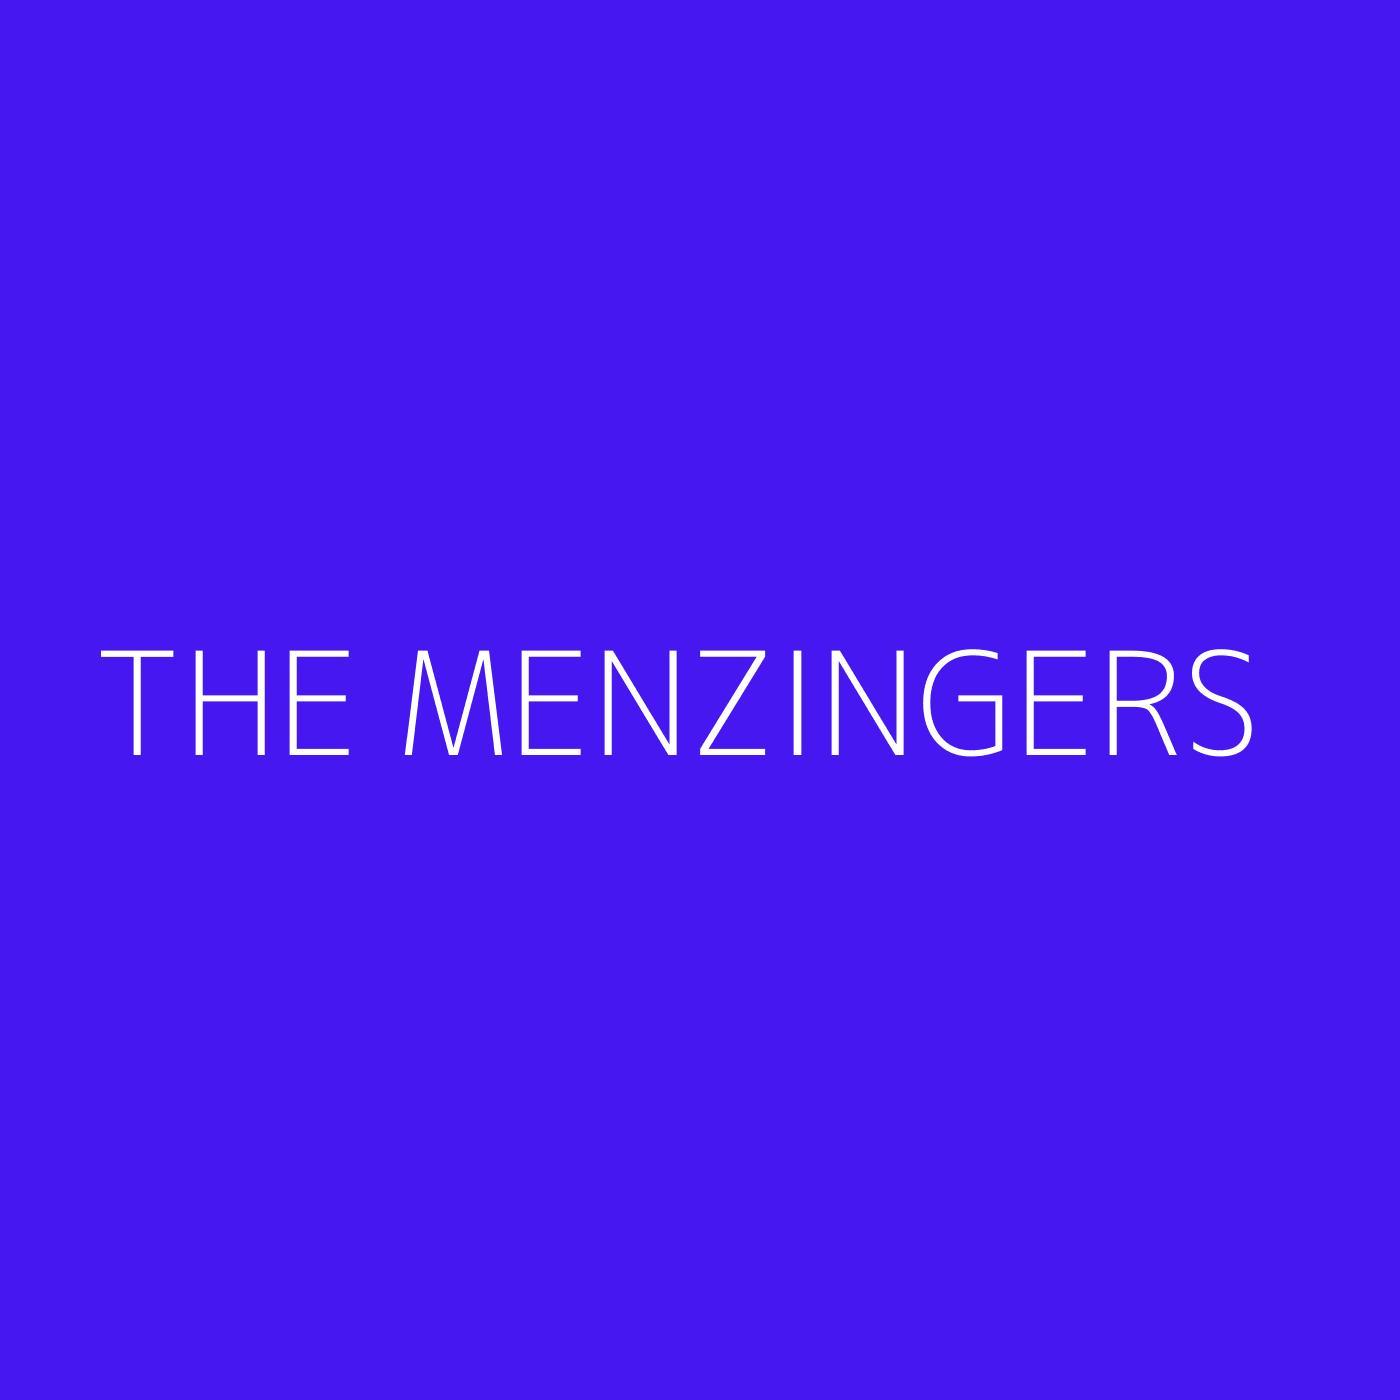 The Menzingers Playlist Artwork